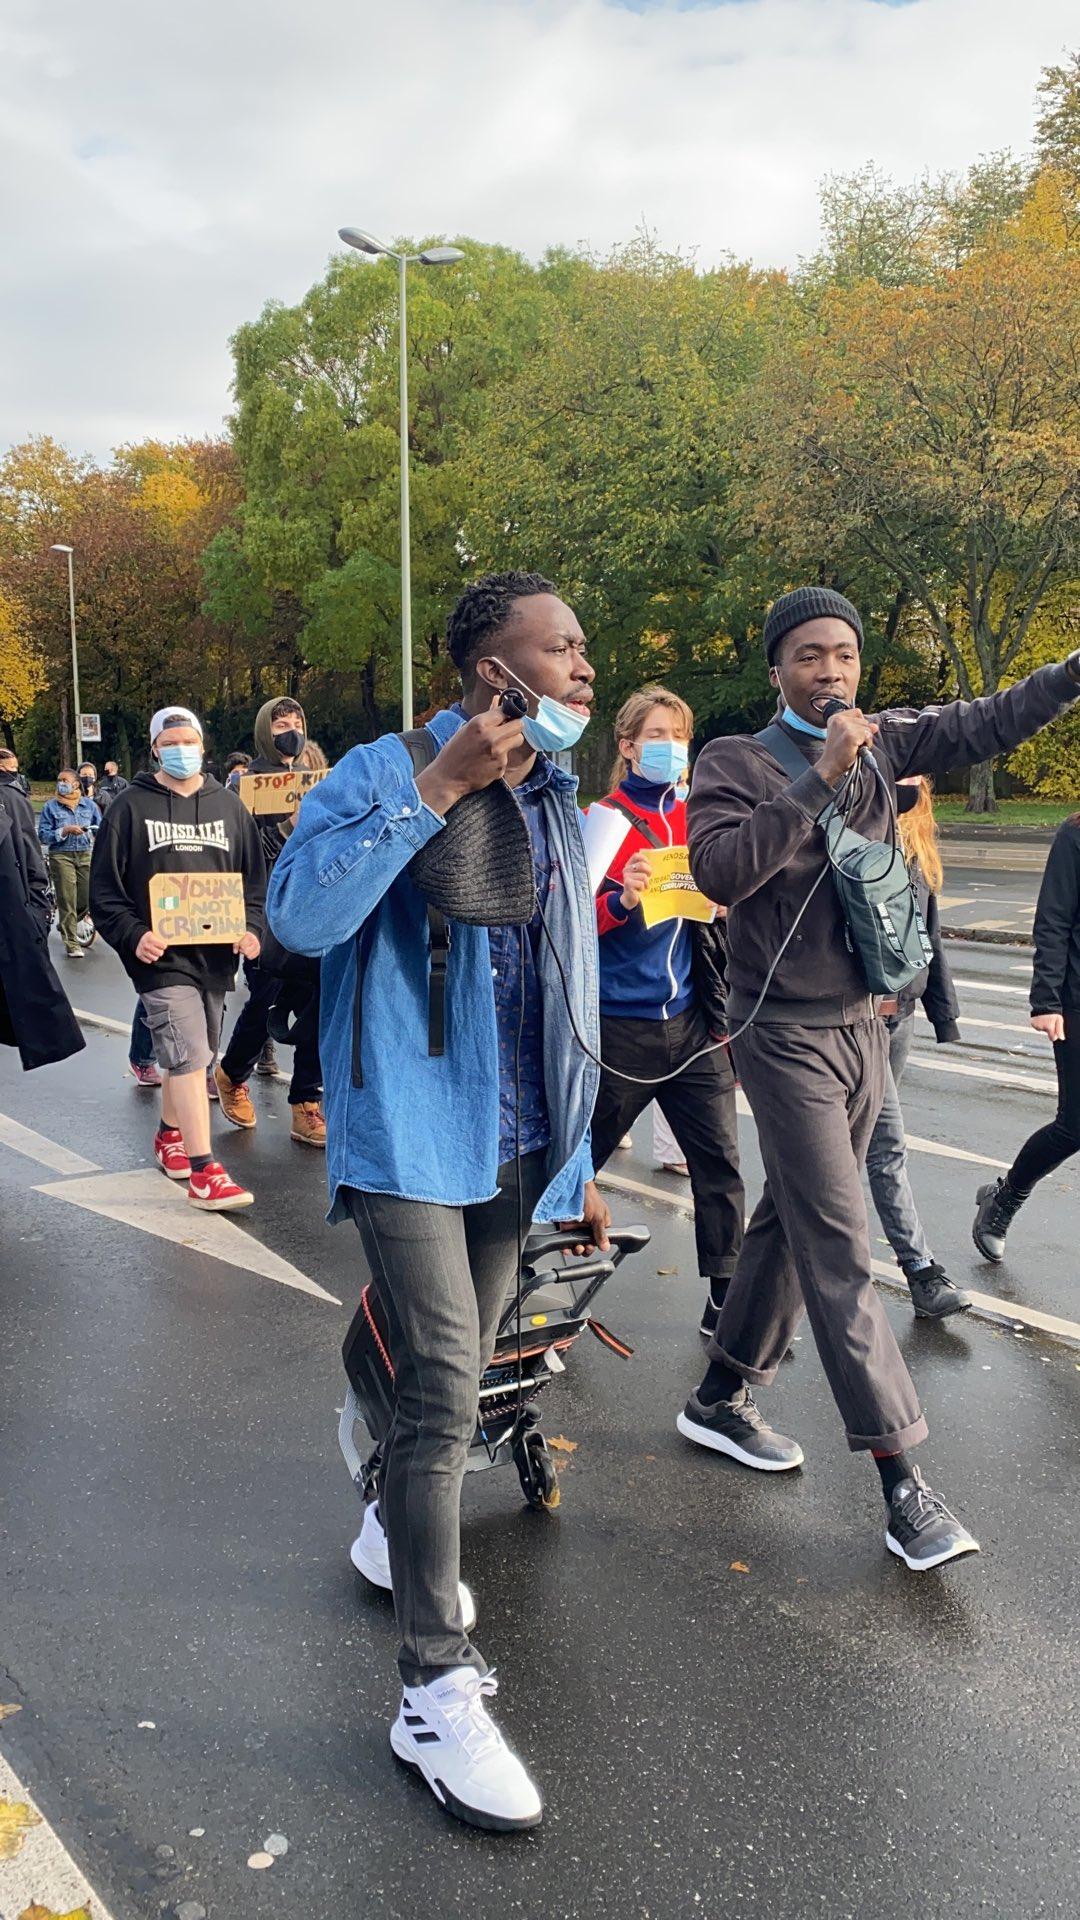 #EndSARS Protesters In Germany